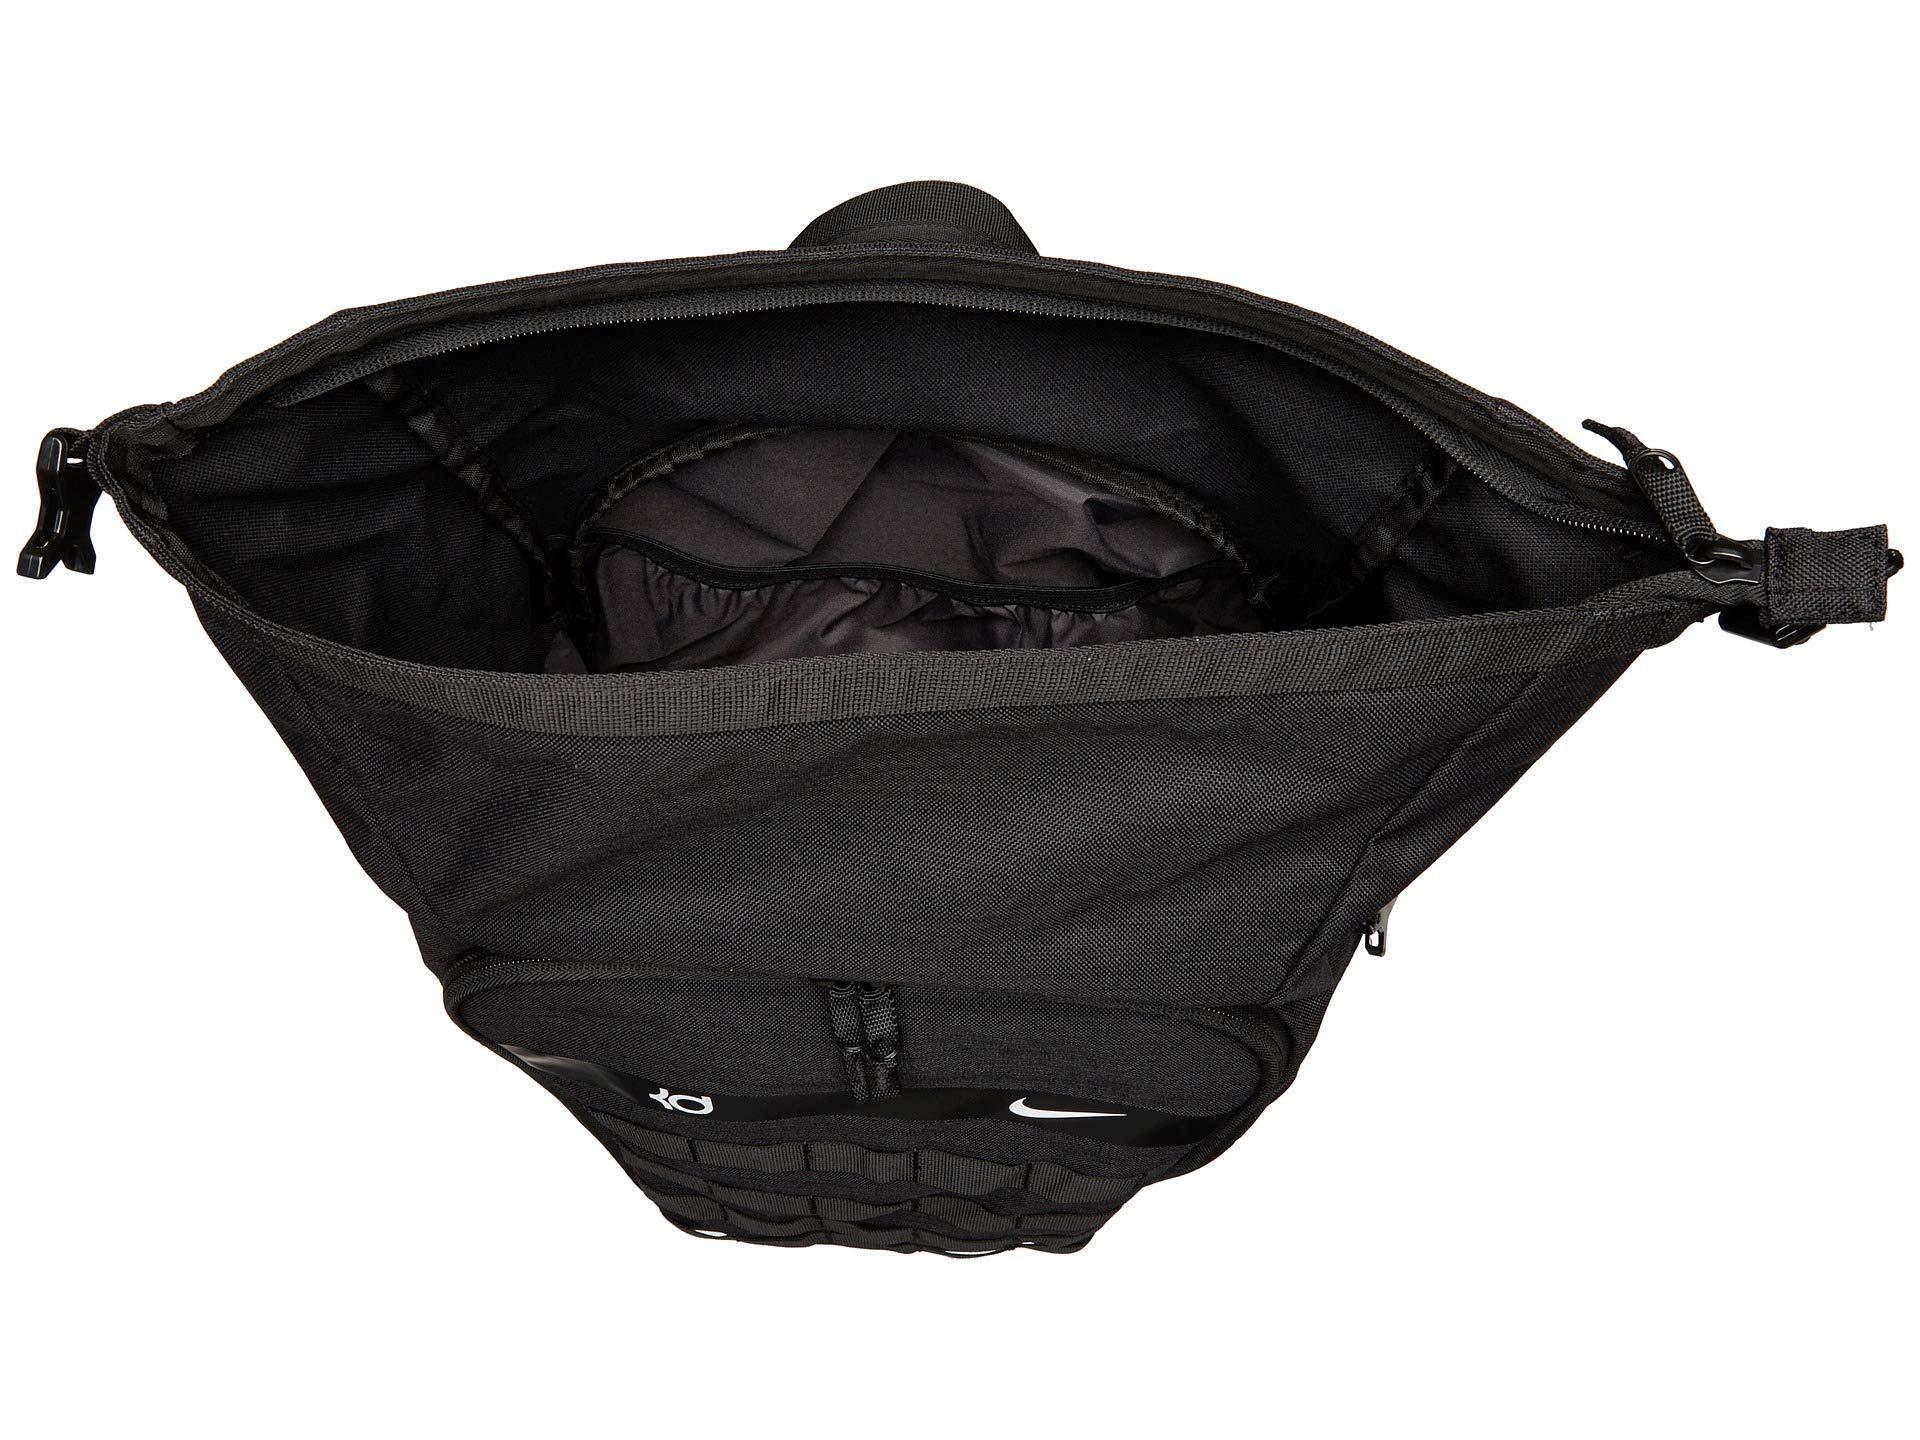 Nike - Kd Trey 5 Backpack (black black white) Backpack Bags for. View  fullscreen 69145637c7af2